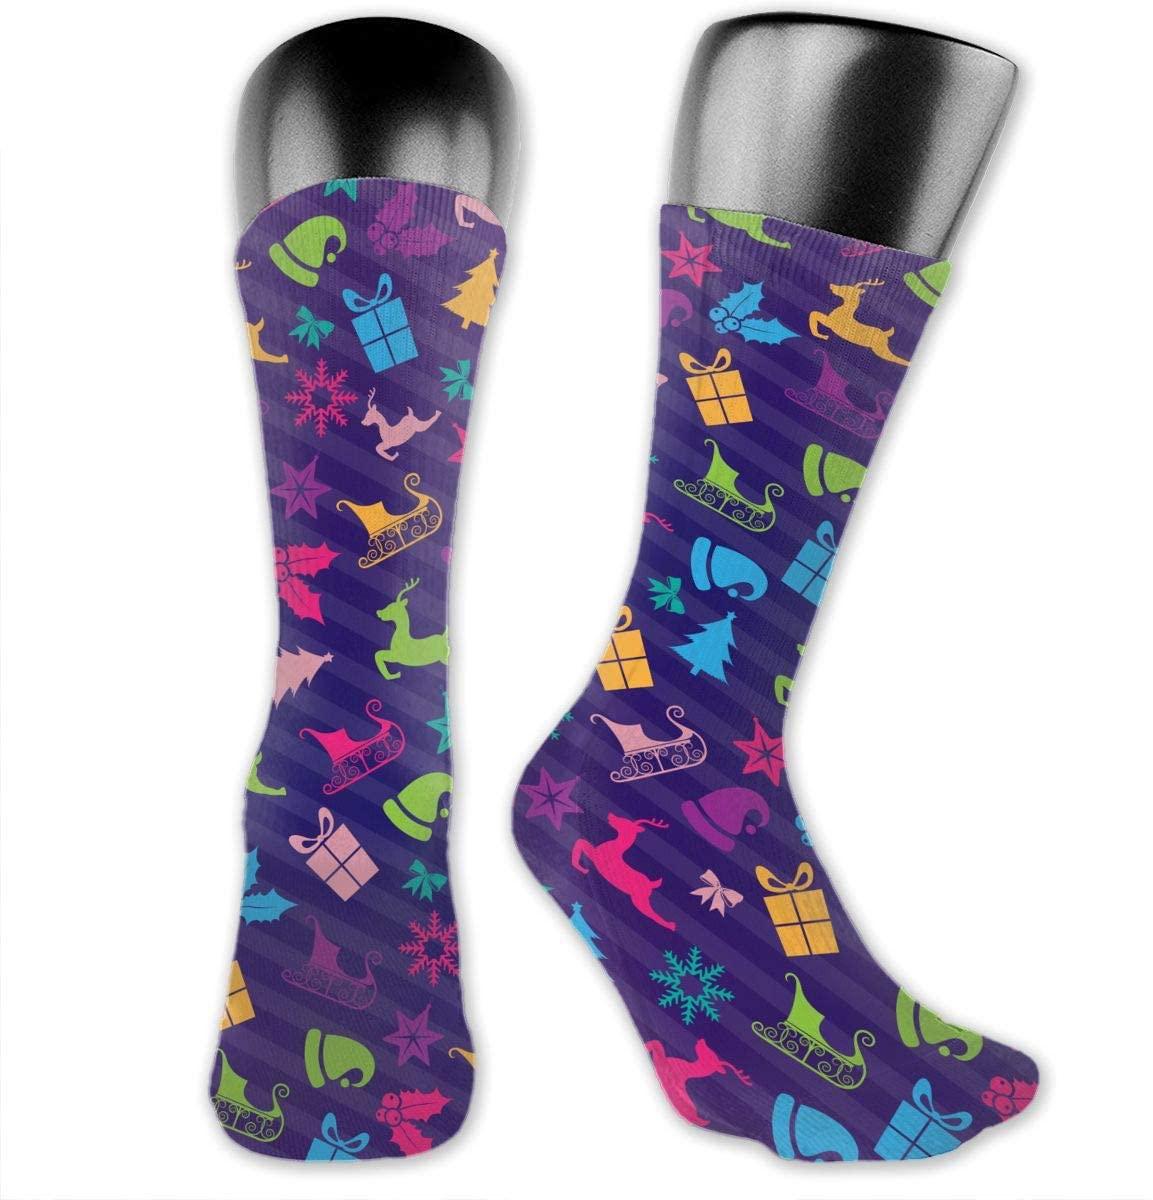 Unisex Outdoor Long Socks Sport Athletic Crew Socks Stockings